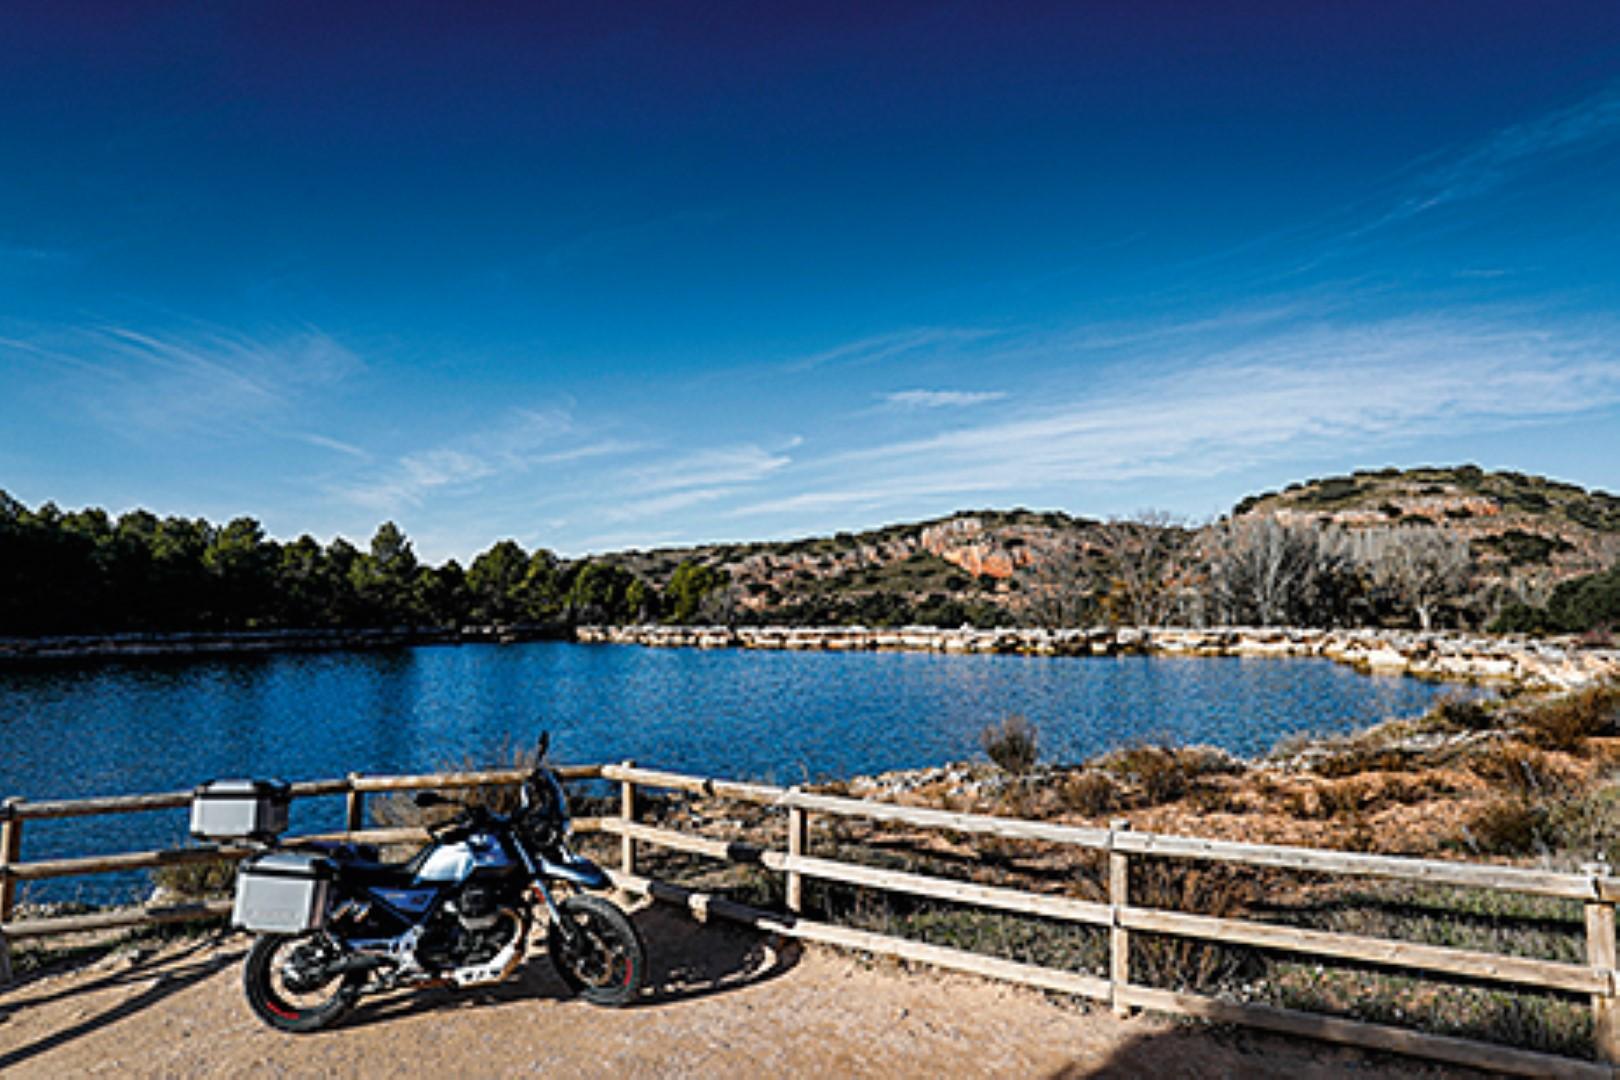 Turismo: Ruta por La Mancha con la Moto Guzzi V85 TT